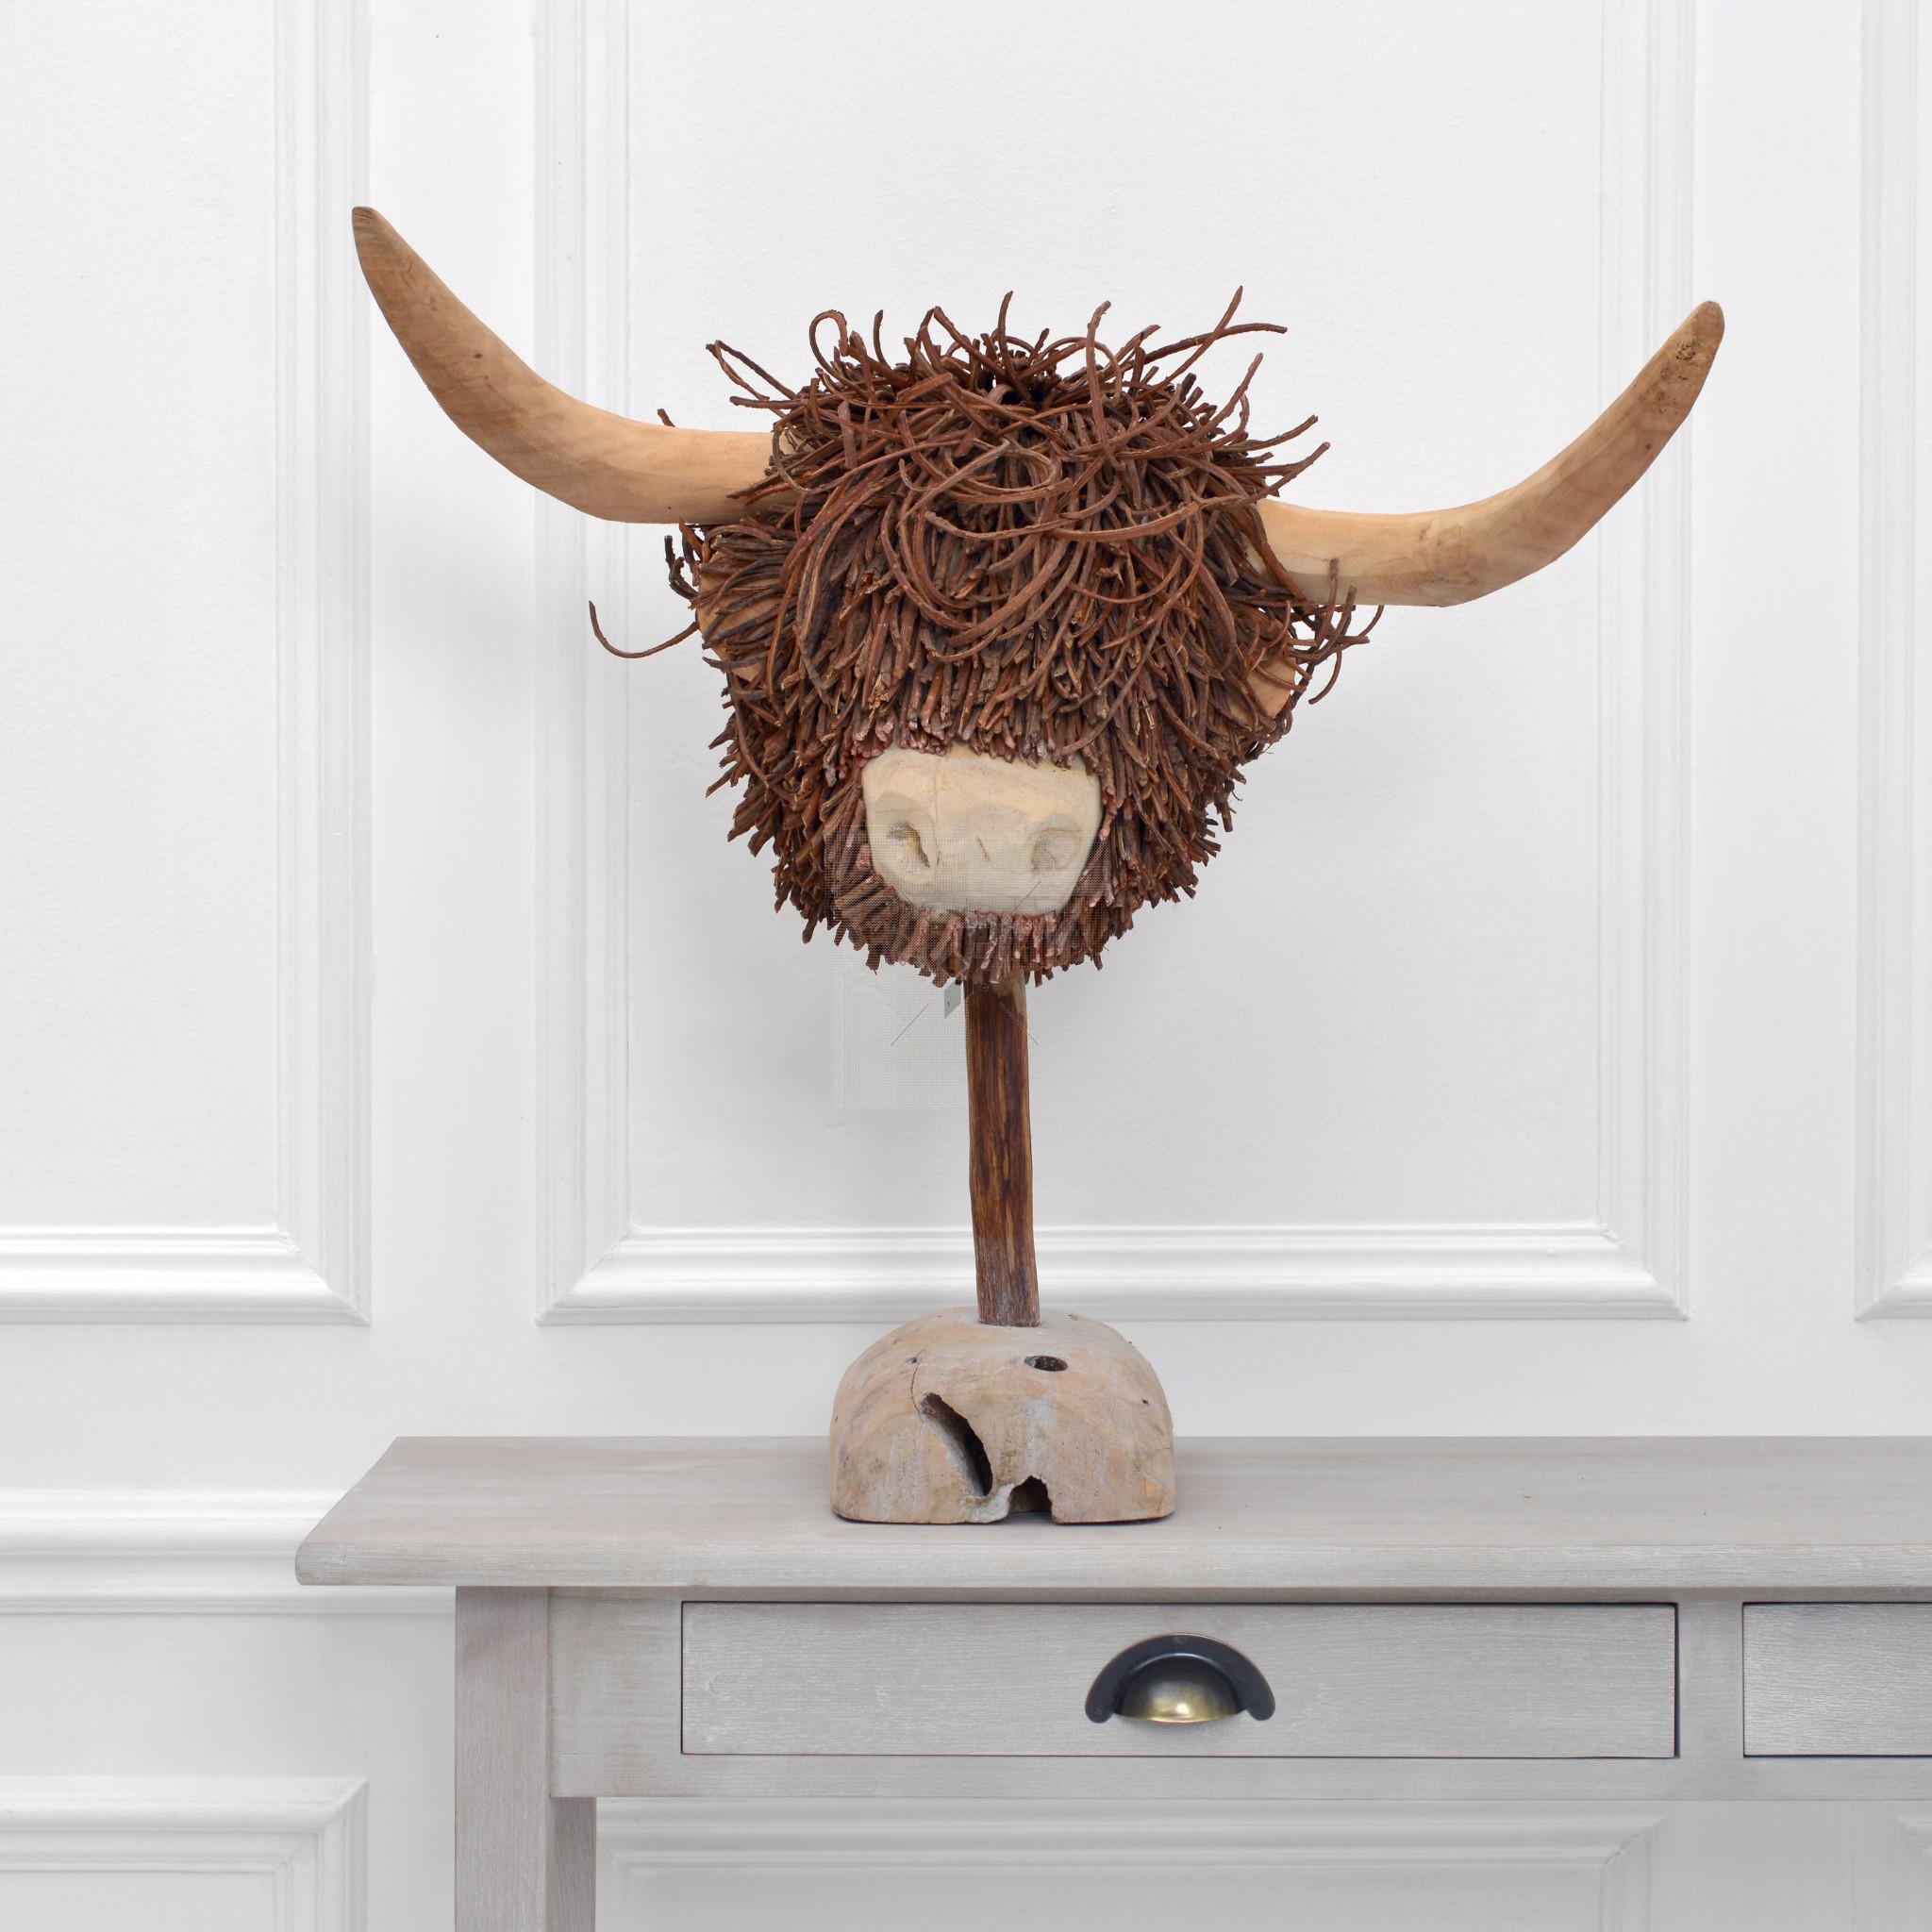 Voyage Maison Highland Cow Wooden Sculpture